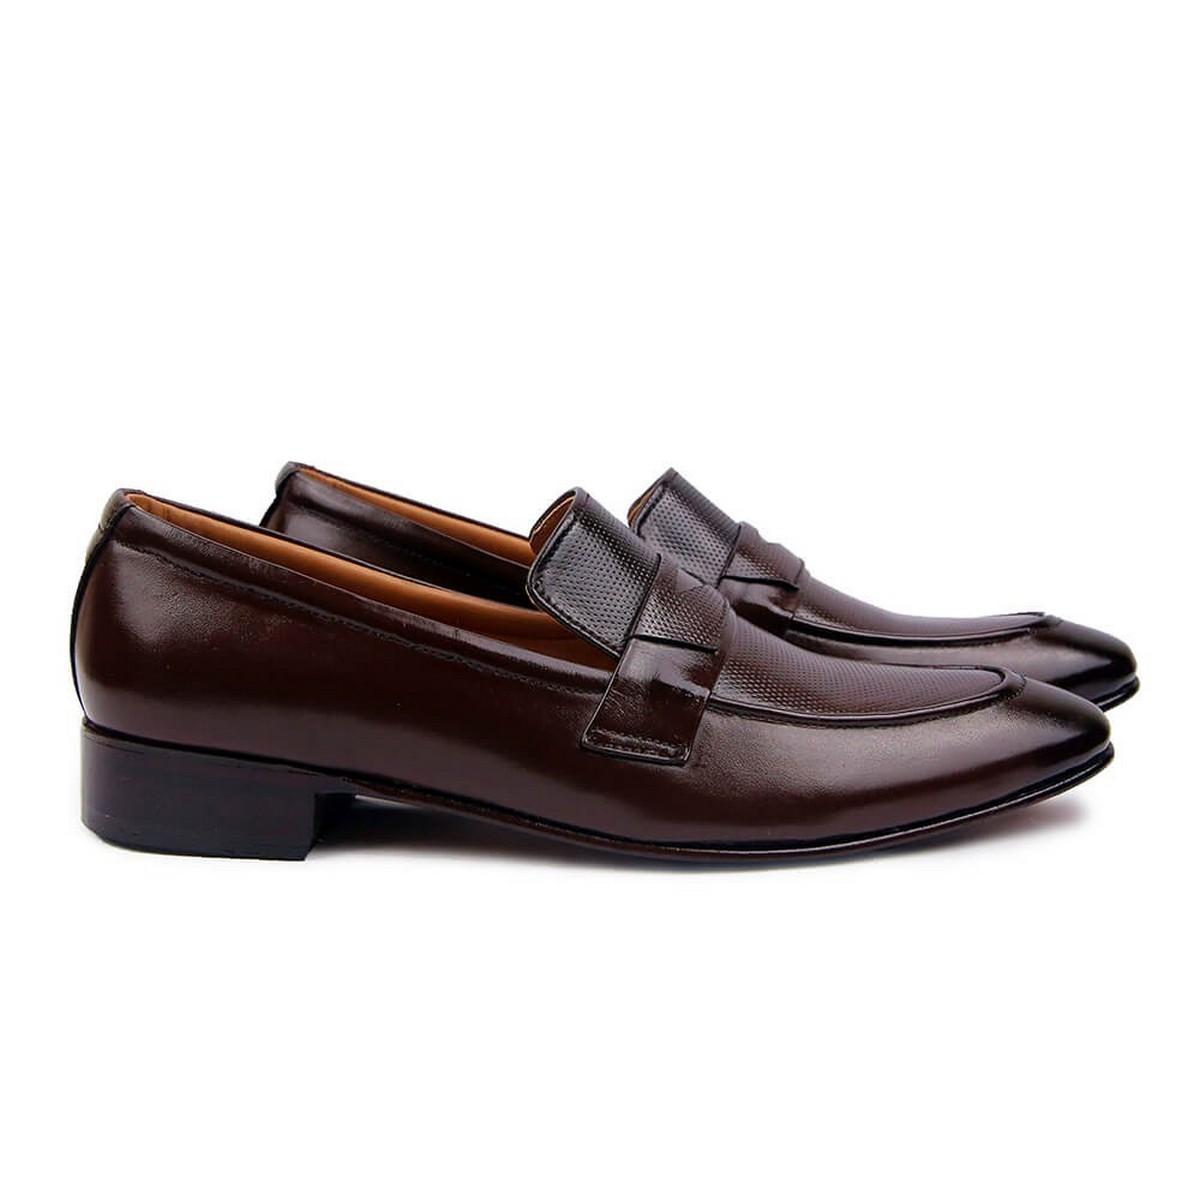 ADRI Premium Brown Handmade Leather Formal / Casual Shoes for Men